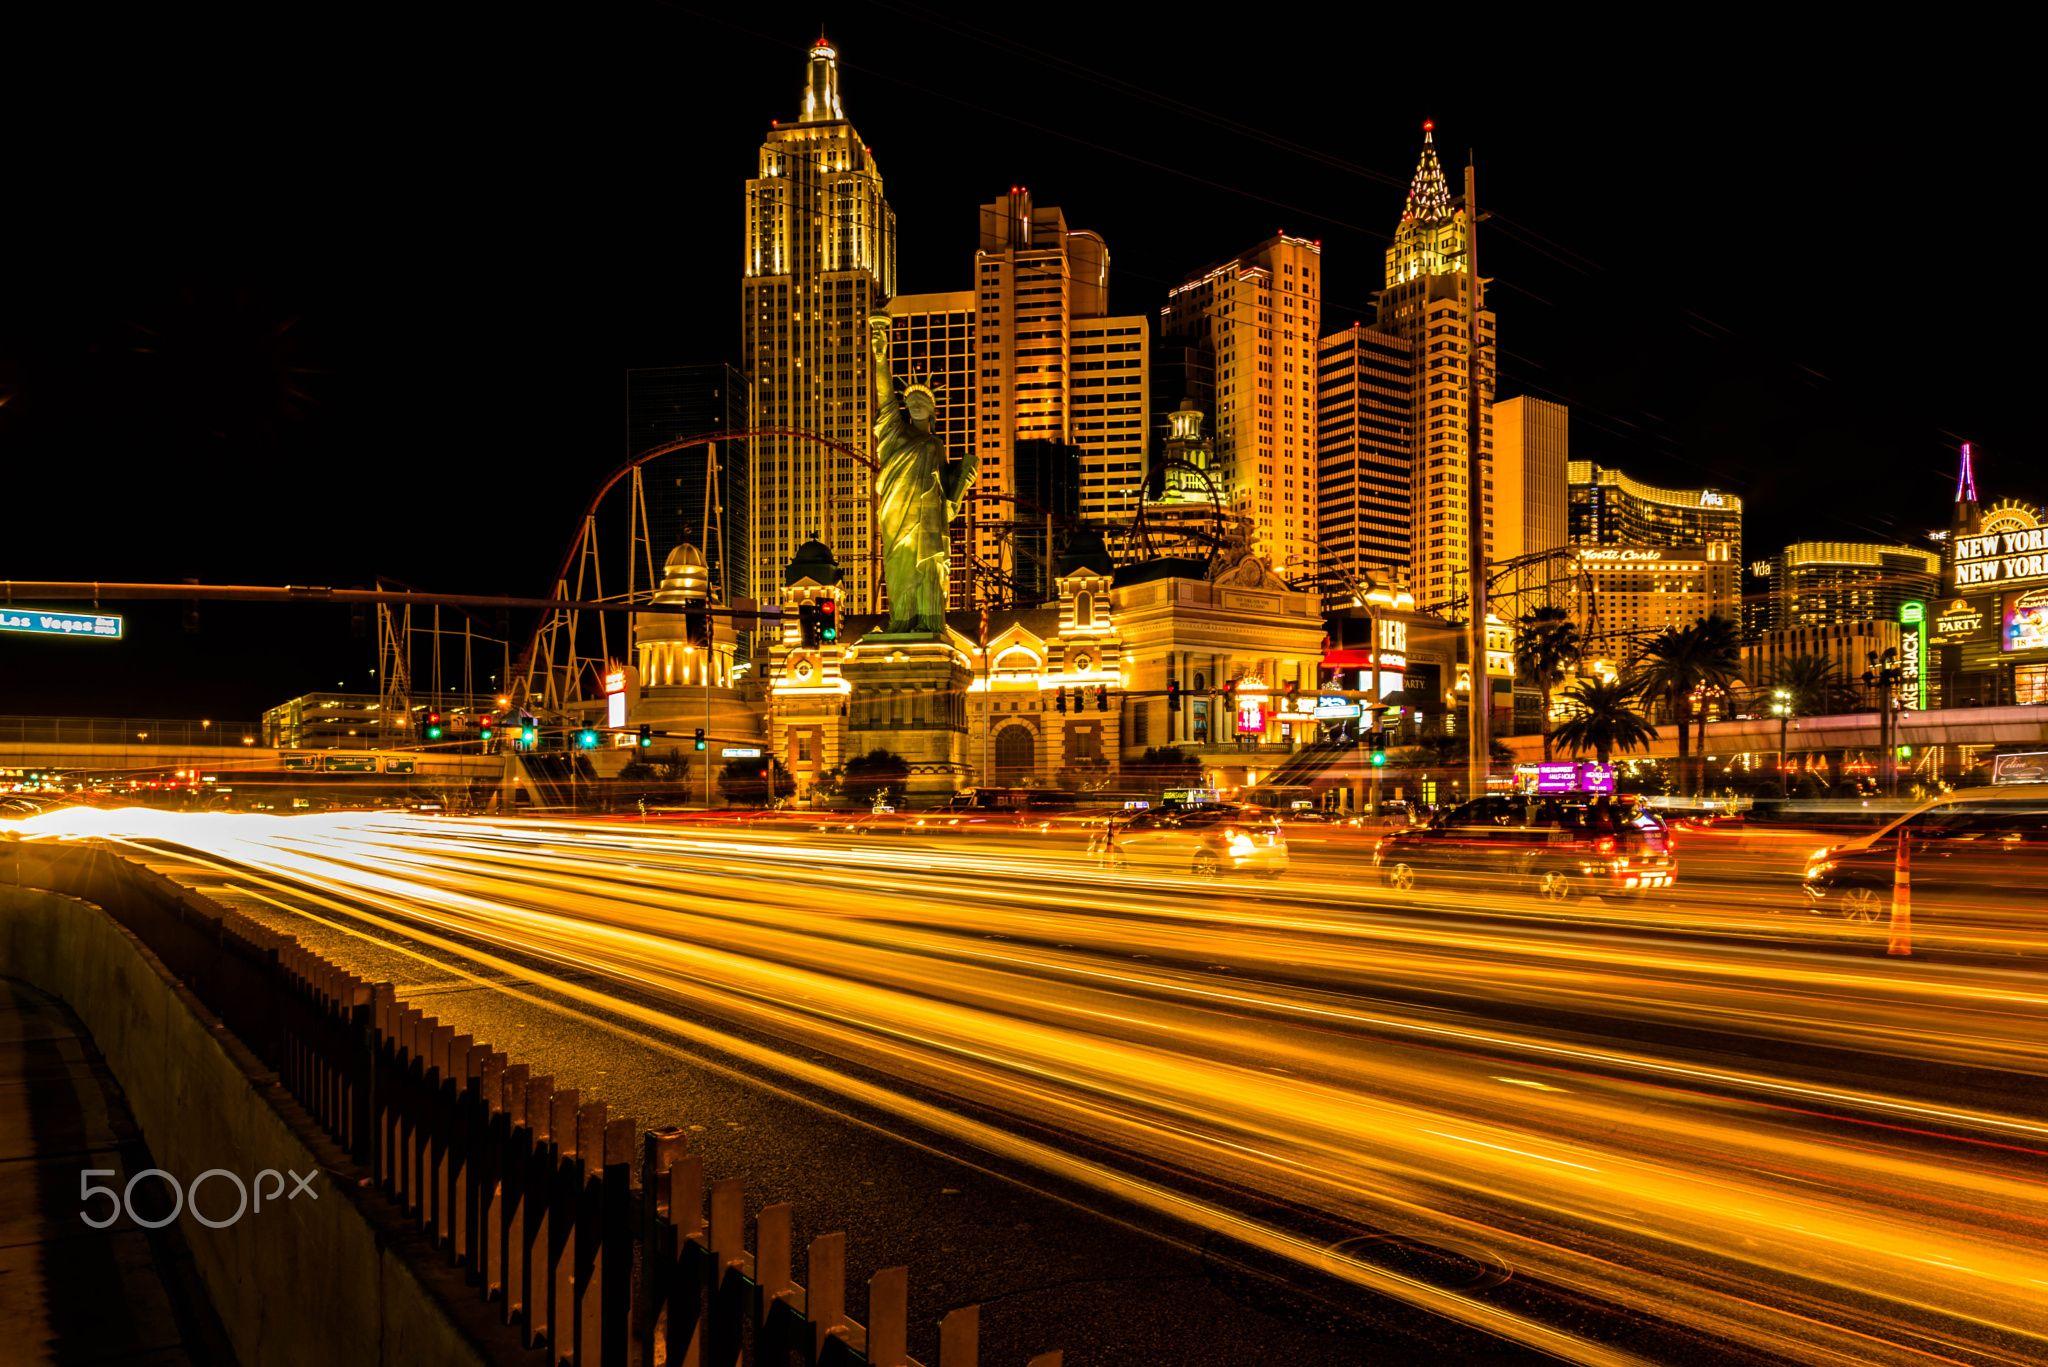 Long Exposure Shot in Vegas - A long exposure shot of New York New York,  Las Vegas NV. a 30 second exposure intensifies the light trails.